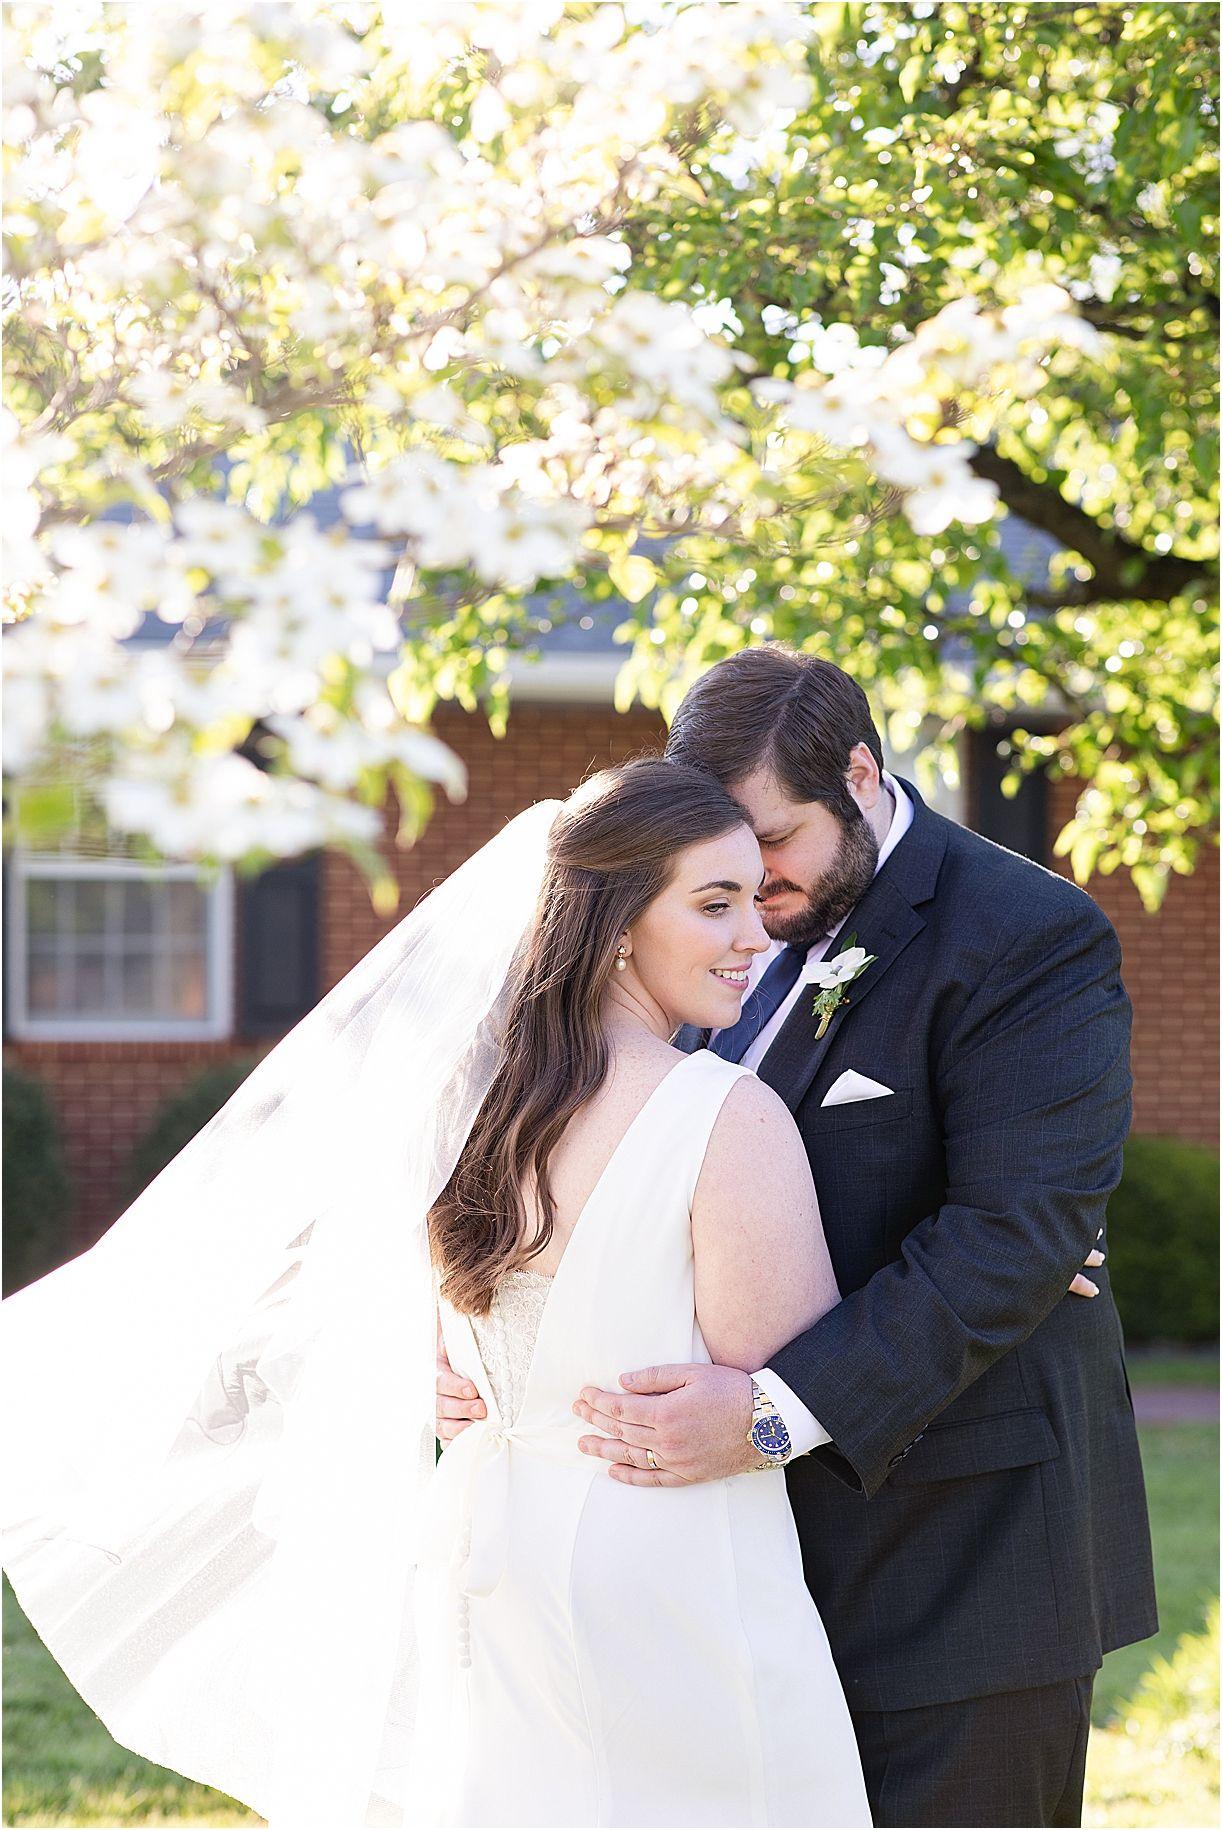 Pin On Wedding Ideas Wedding Tips